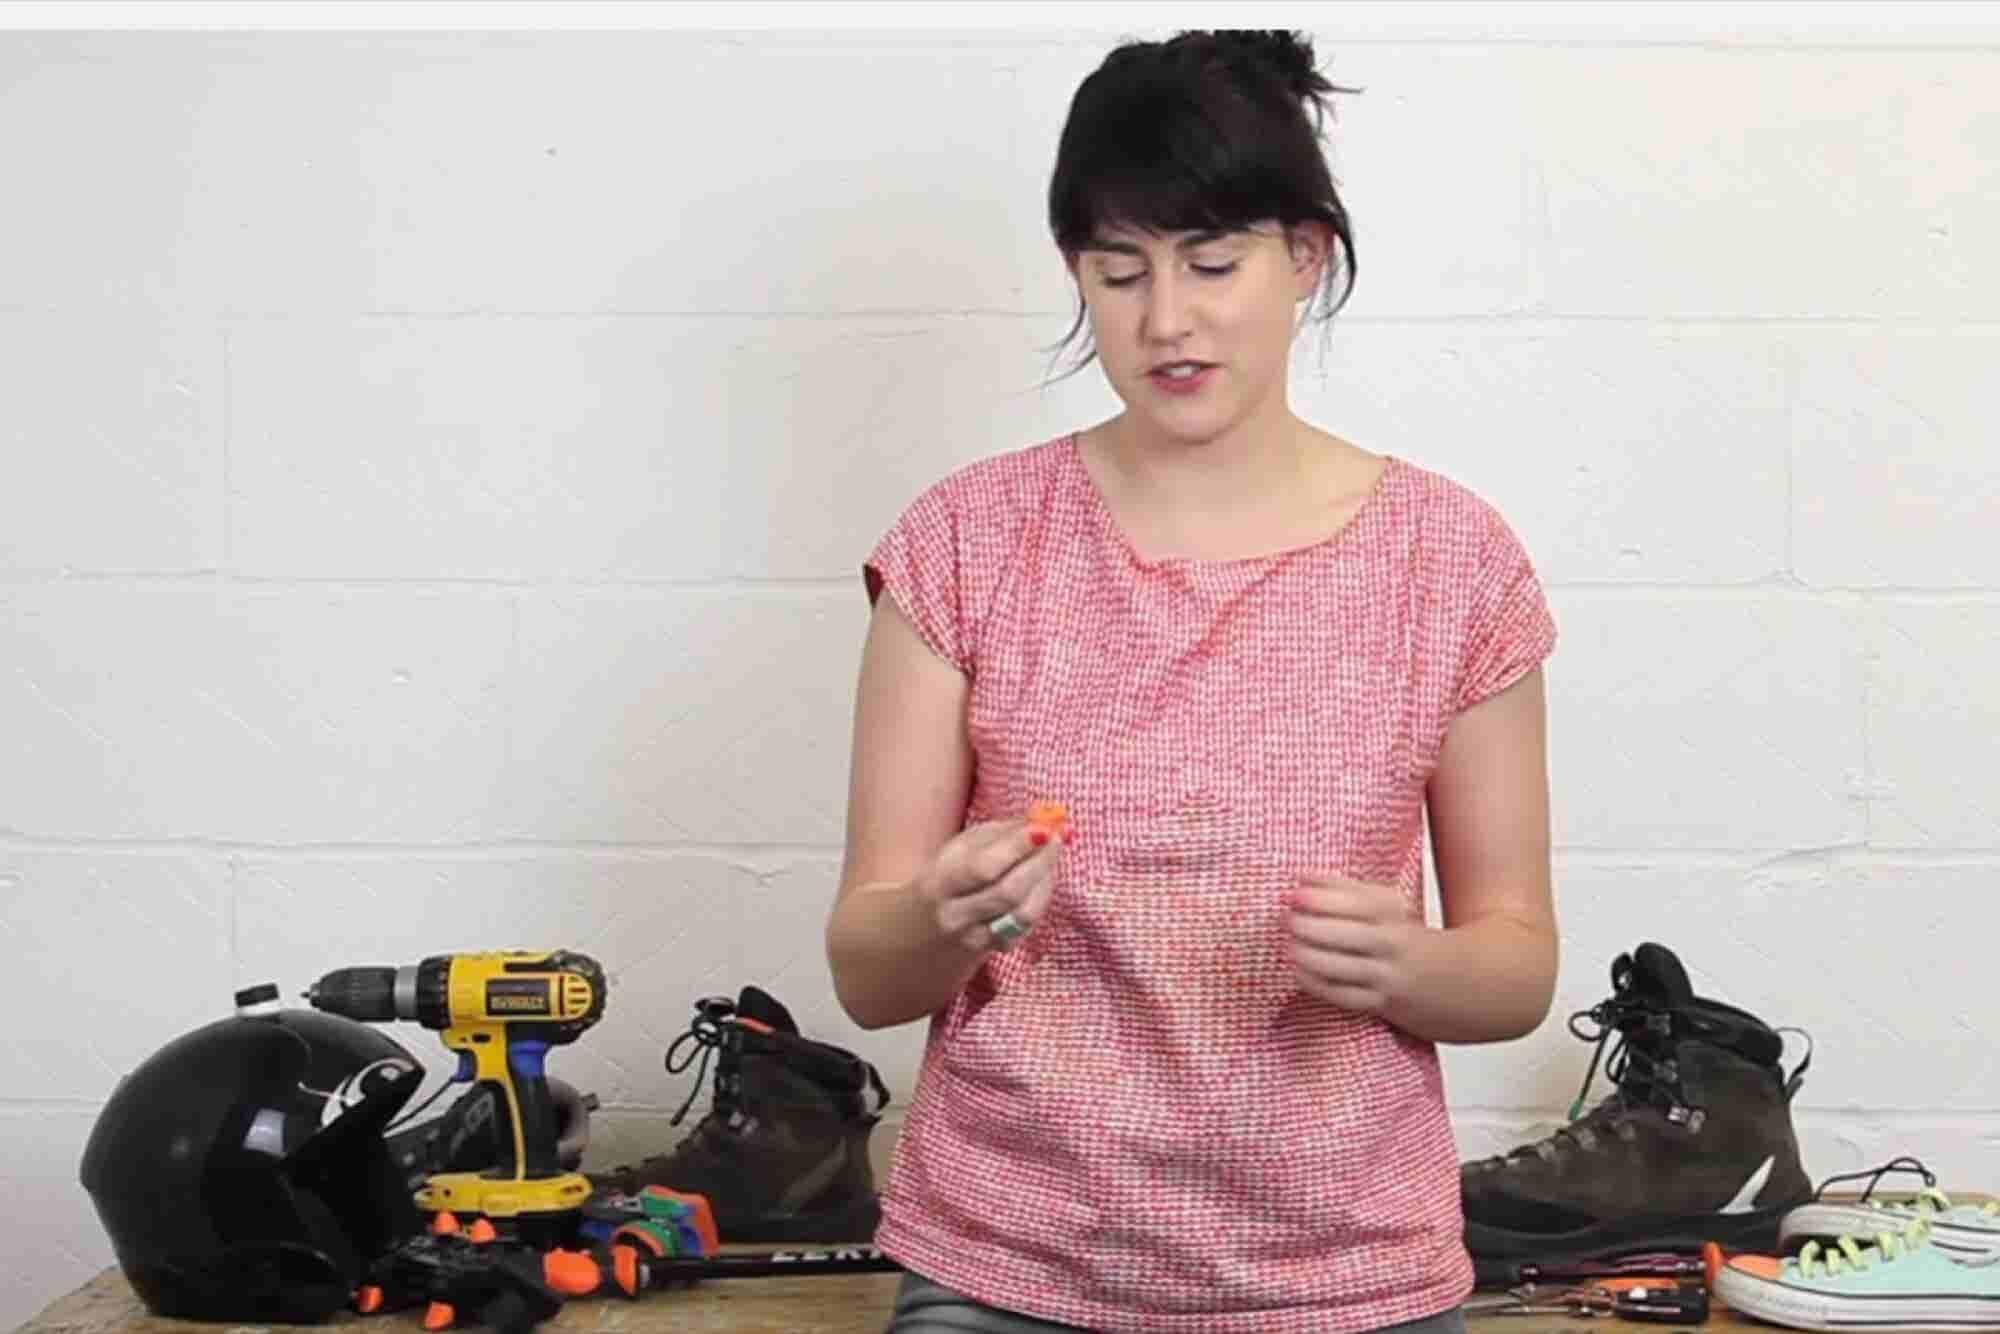 How a Glue Developer Turned Bad Luck Into a DIY Sensation